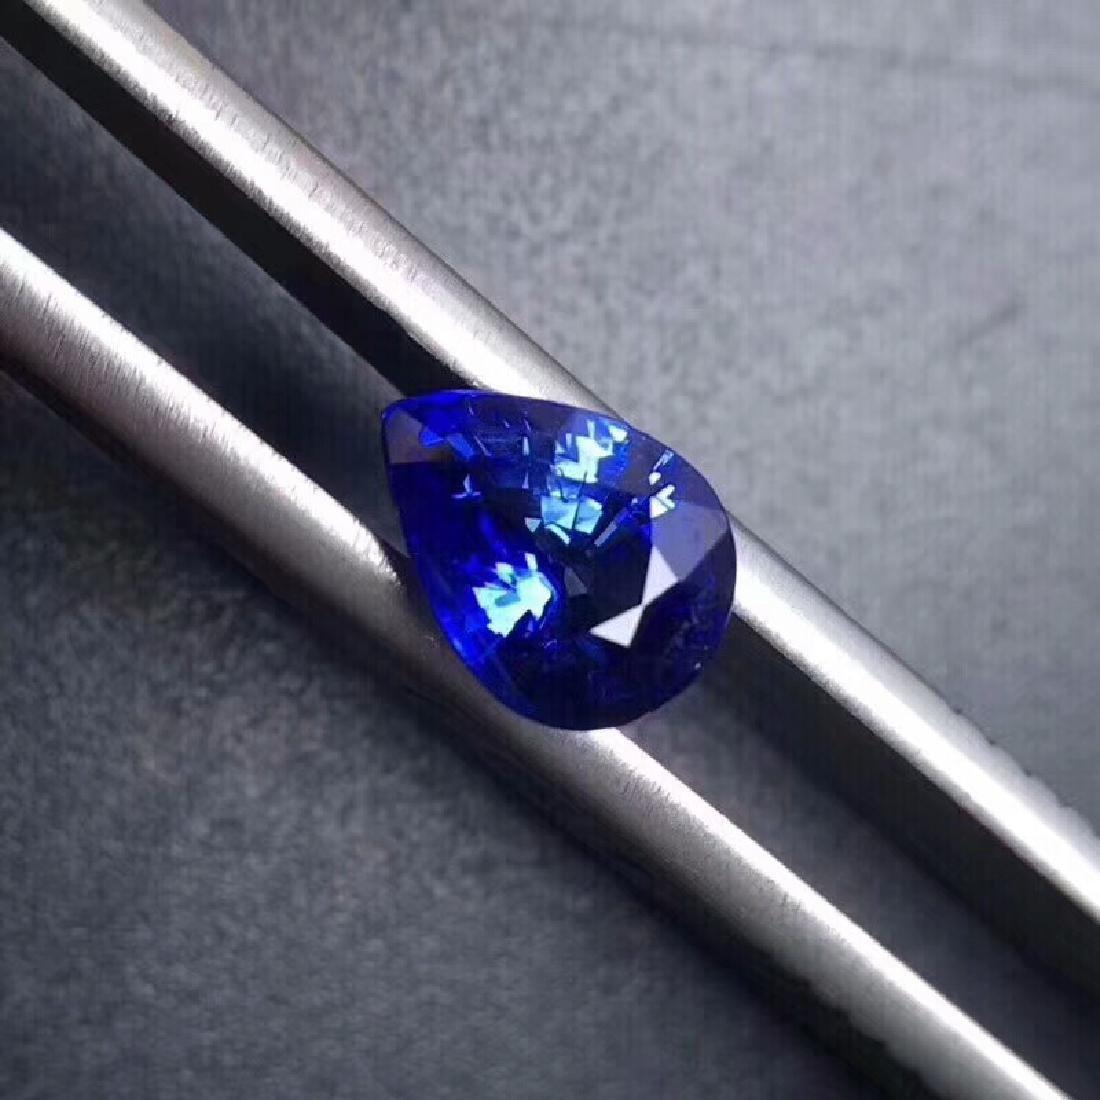 1.40 ct Sapphire 3.7*7.8*5.9 mm Oval Cut - 2